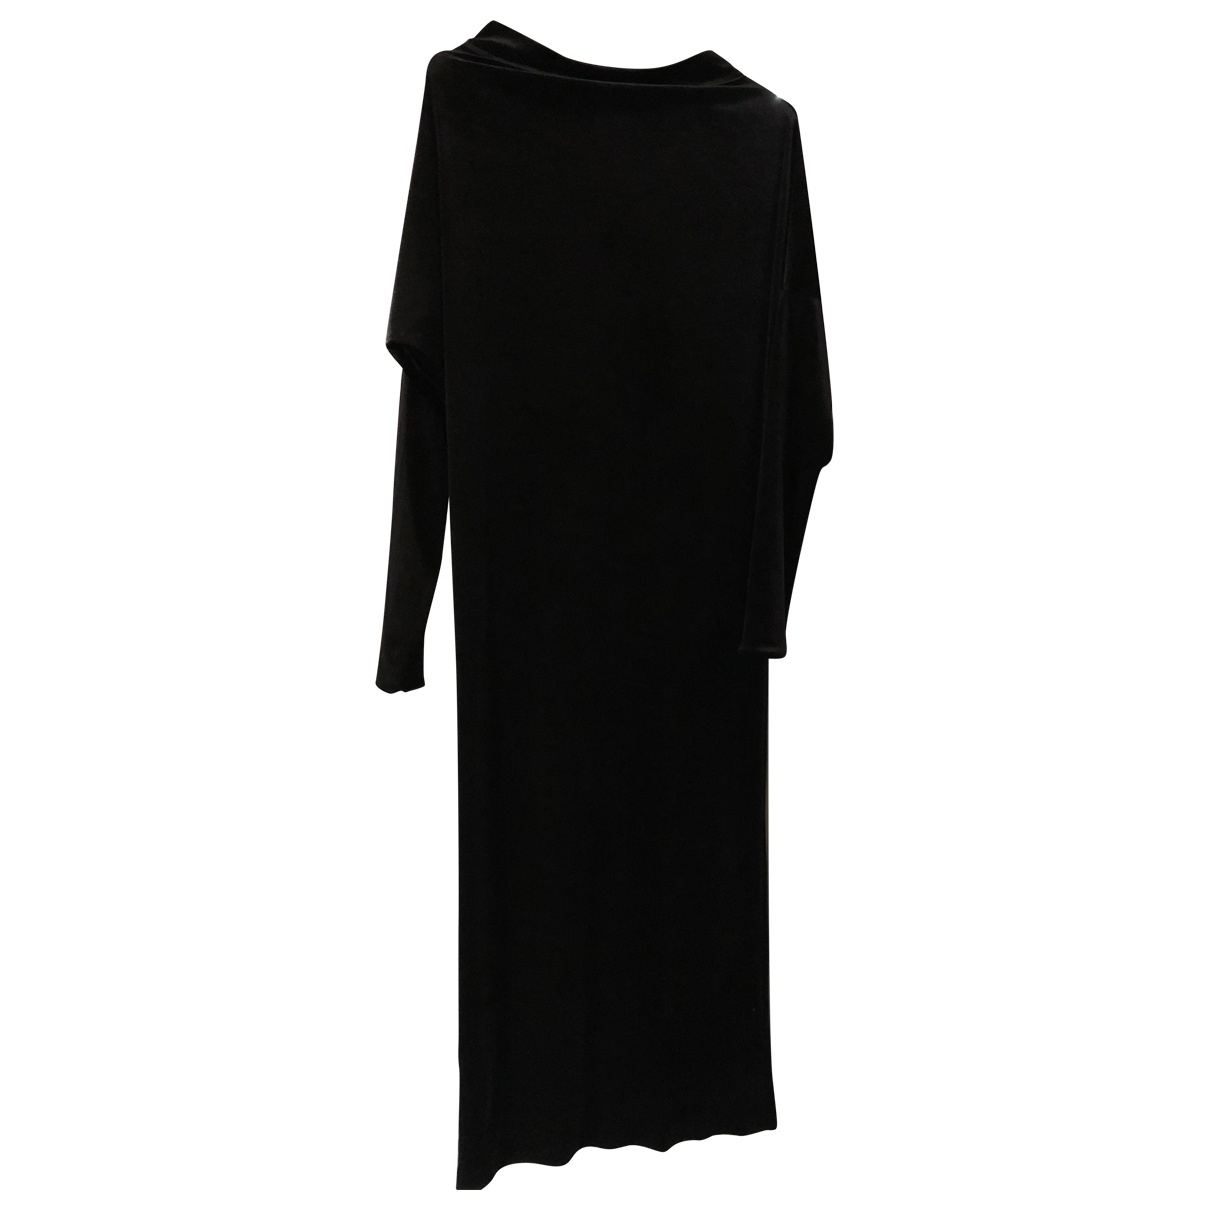 Norma Kamali \N Black dress for Women XS International